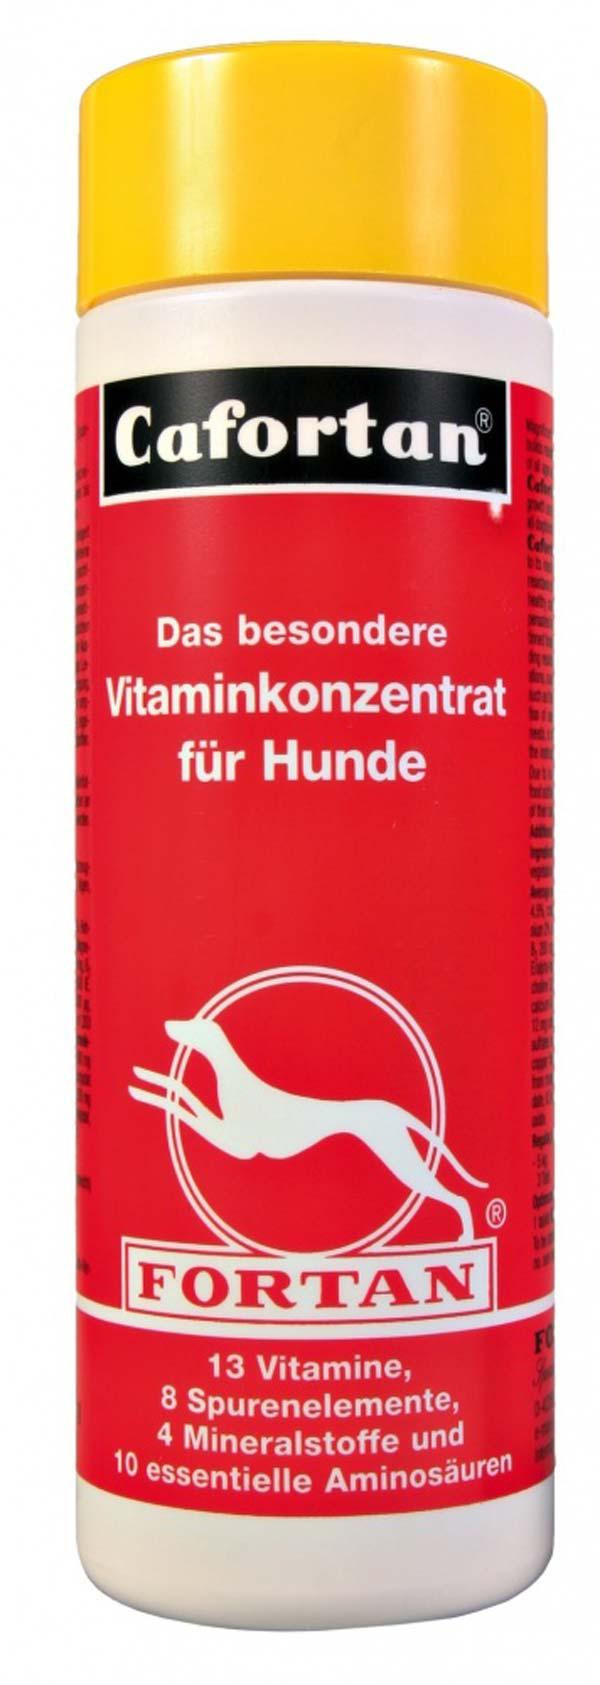 Cafortan Vitaminkonzentrat für Hunde - 300 g / 600 Tabletten   Ergänzungsfuttermittel   Hundefutter   Hund   brands4pets